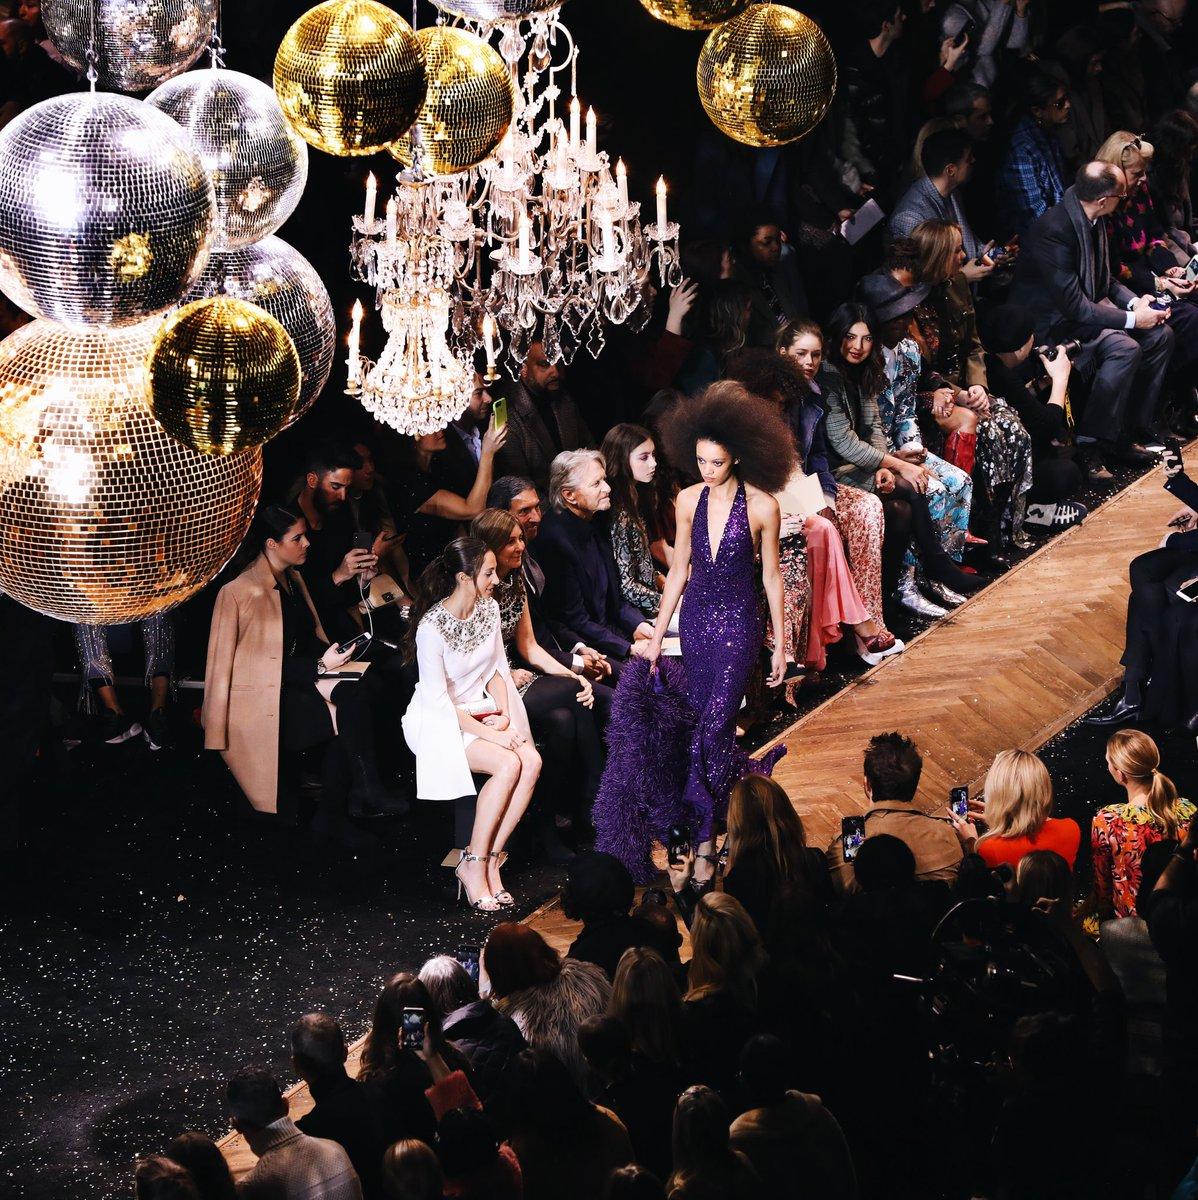 Ballroom beauty. #AllAccessKors #MichaelKorsCollection #NYFW https://t.co/ySuUK1m6UD